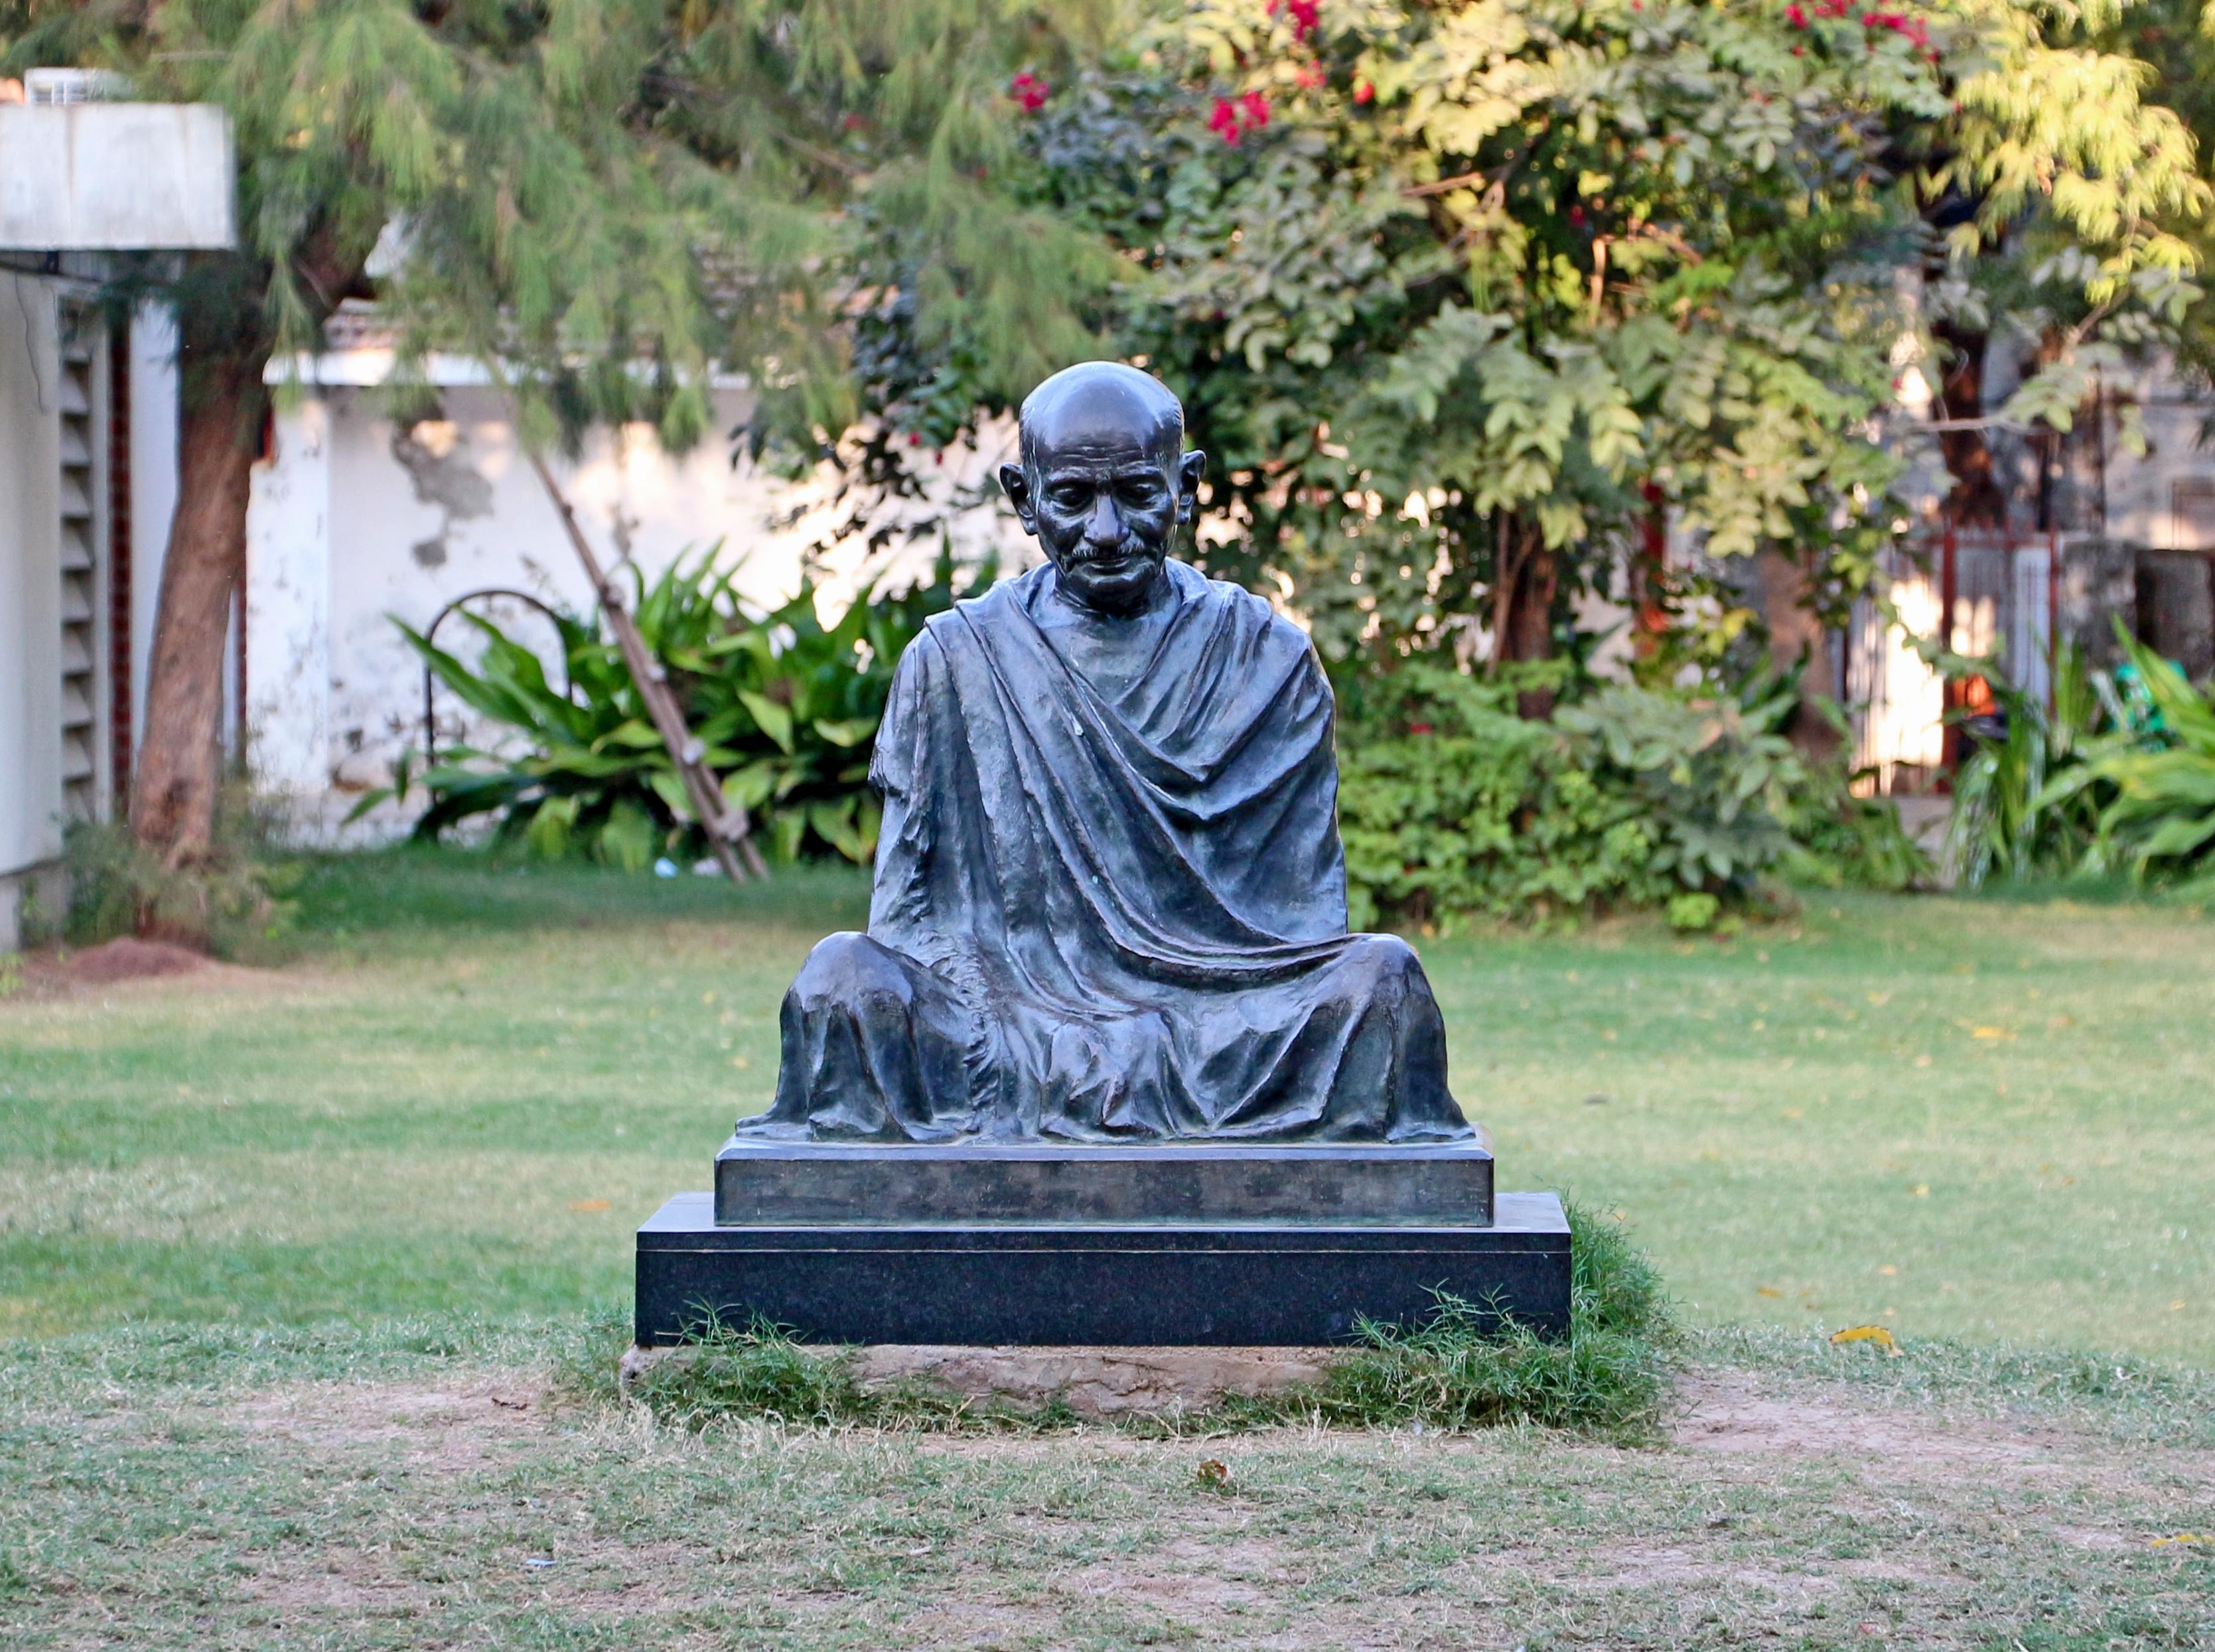 A statue of Gandhi at Sabarmati Ashram.